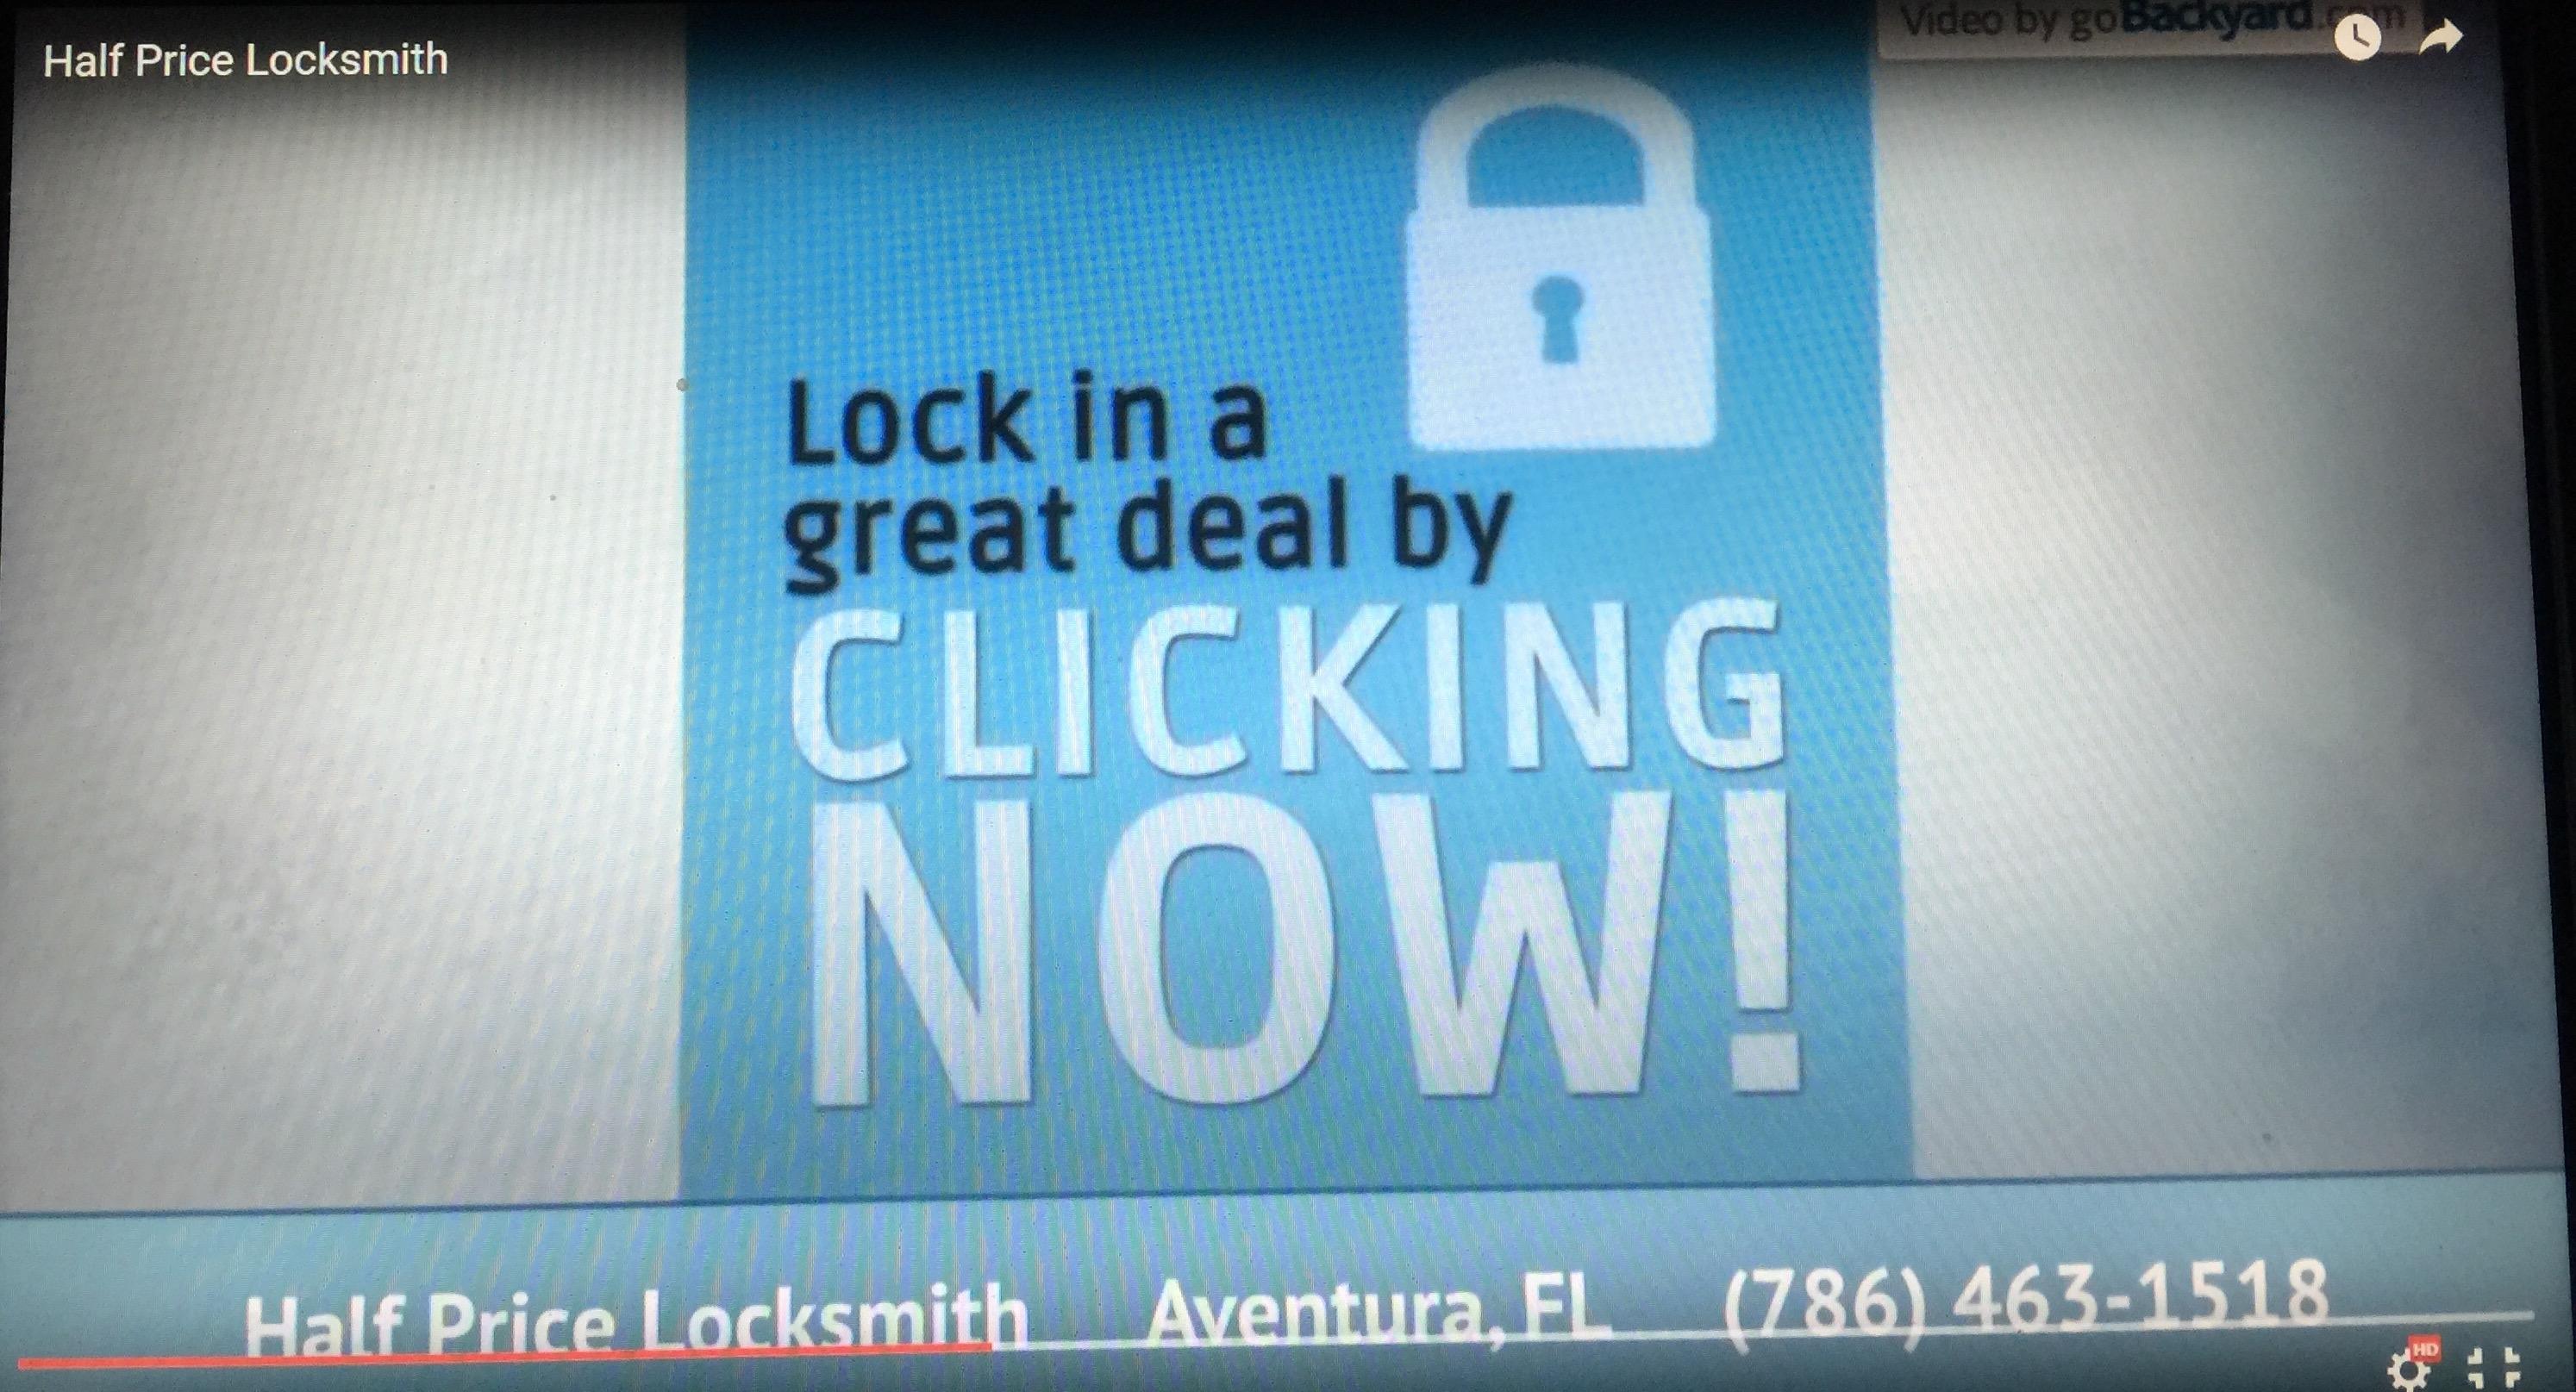 Half Price Locksmith image 10